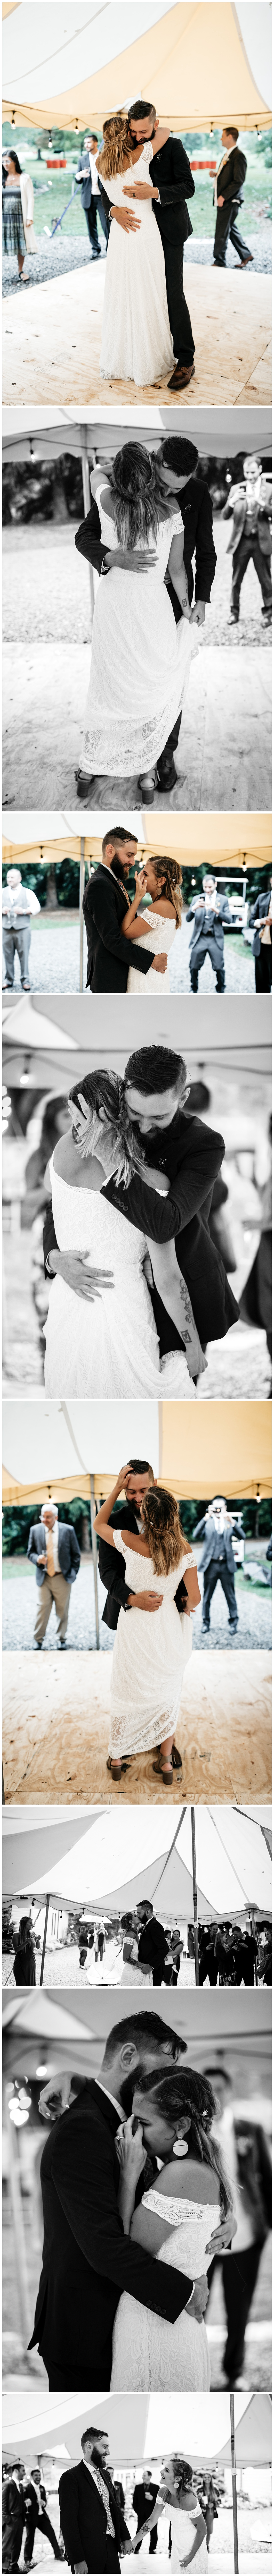 grovecitypabackyardweddingweddingphotographer_0036.jpg